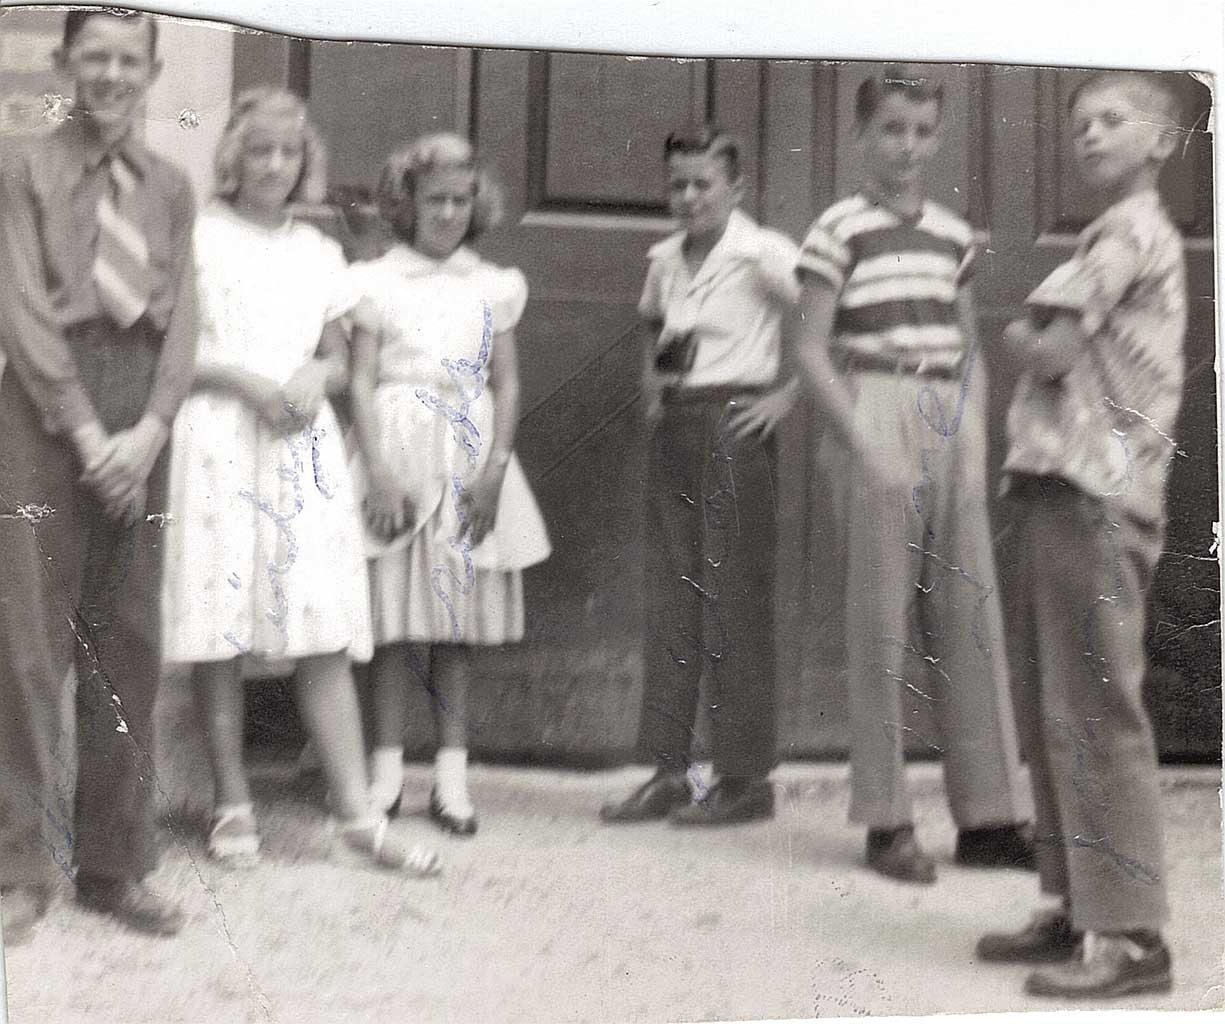 CHS class in Wmsbg. Horace, Shirley, Brenda, Wm